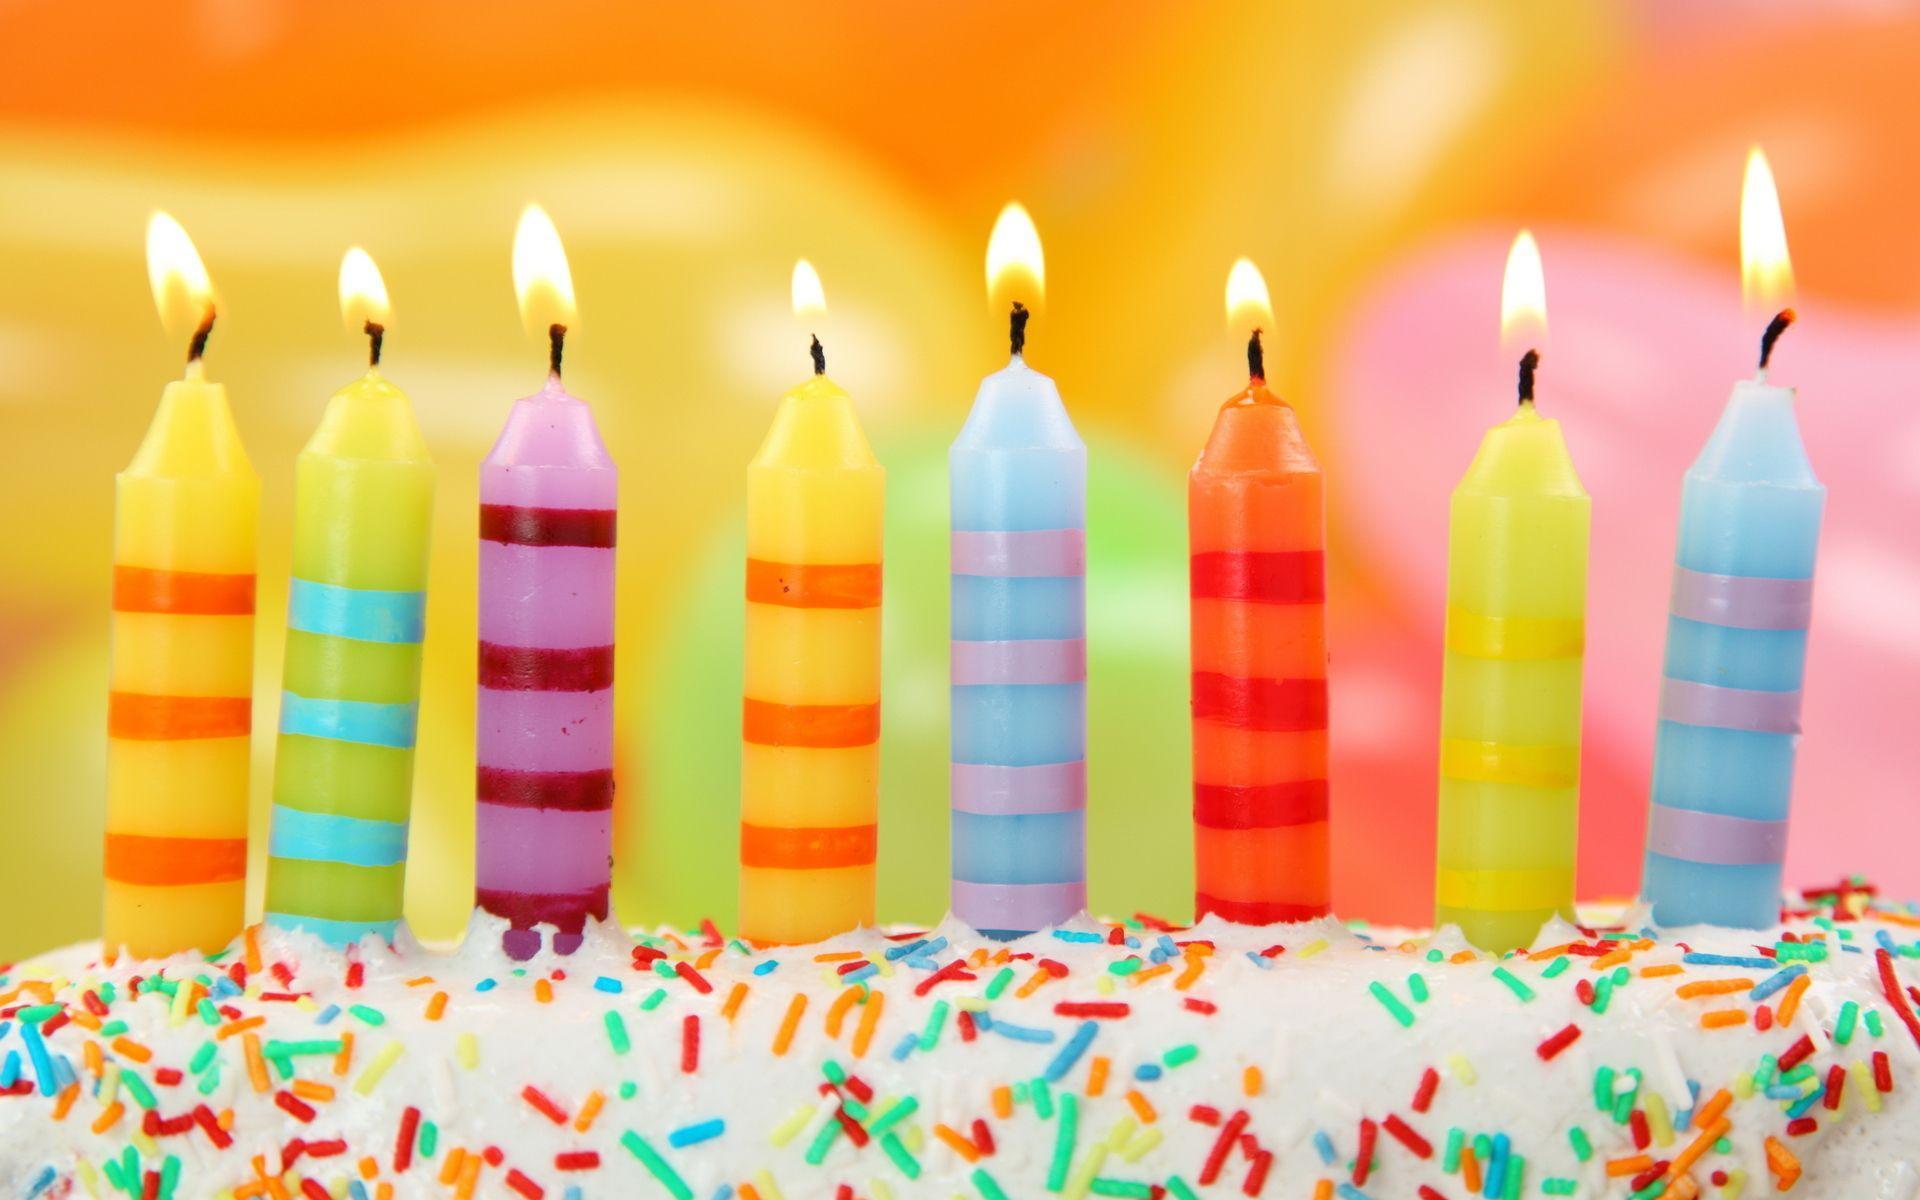 Candle Happy Birthday Wallpaper Desktop #5786 Wallpaper | High ...